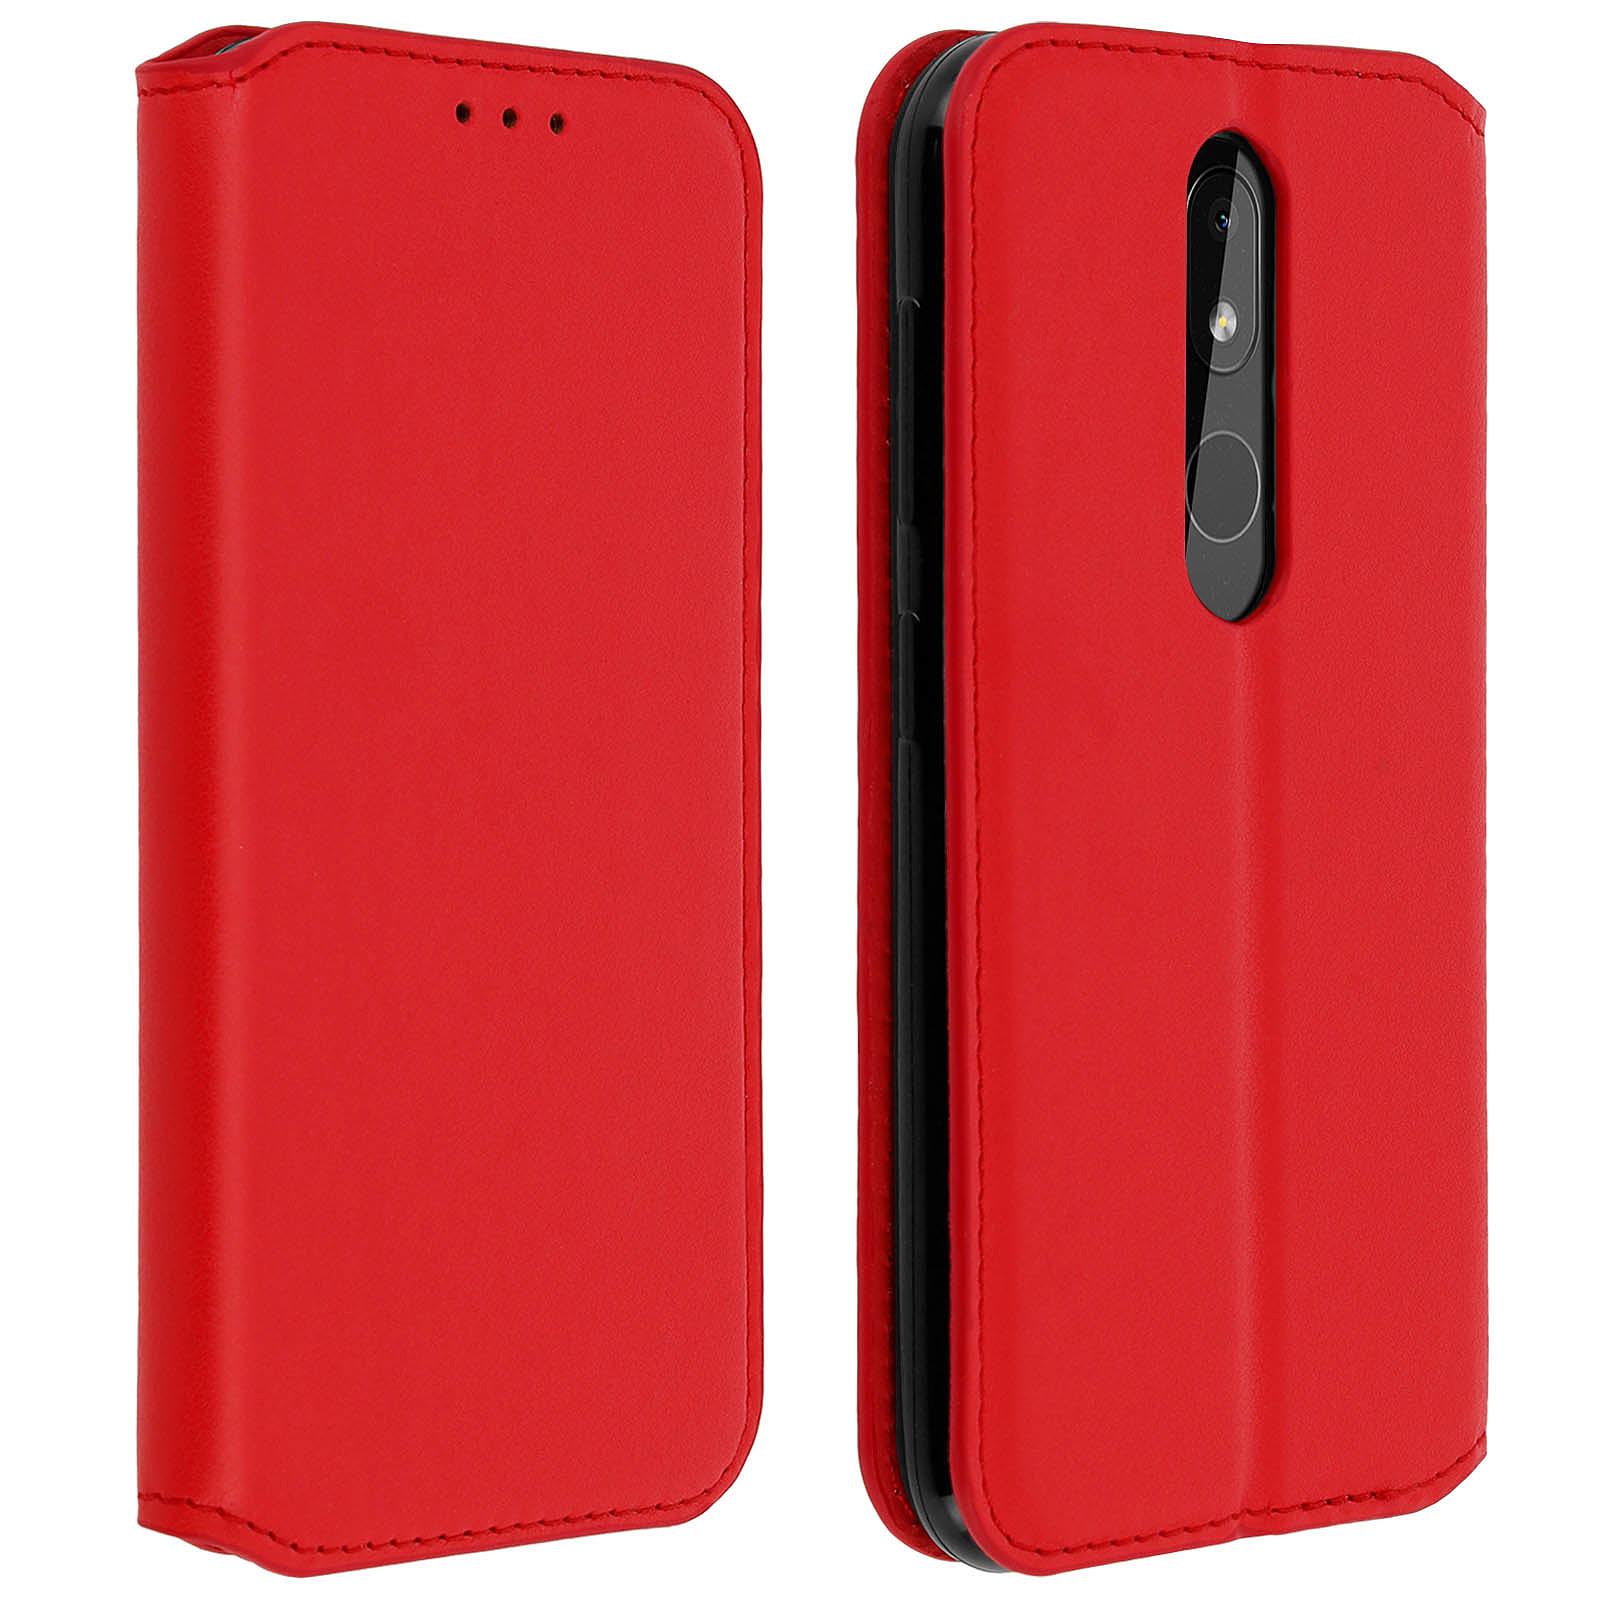 Avizar Etui folio Rouge pour Nokia 3.2